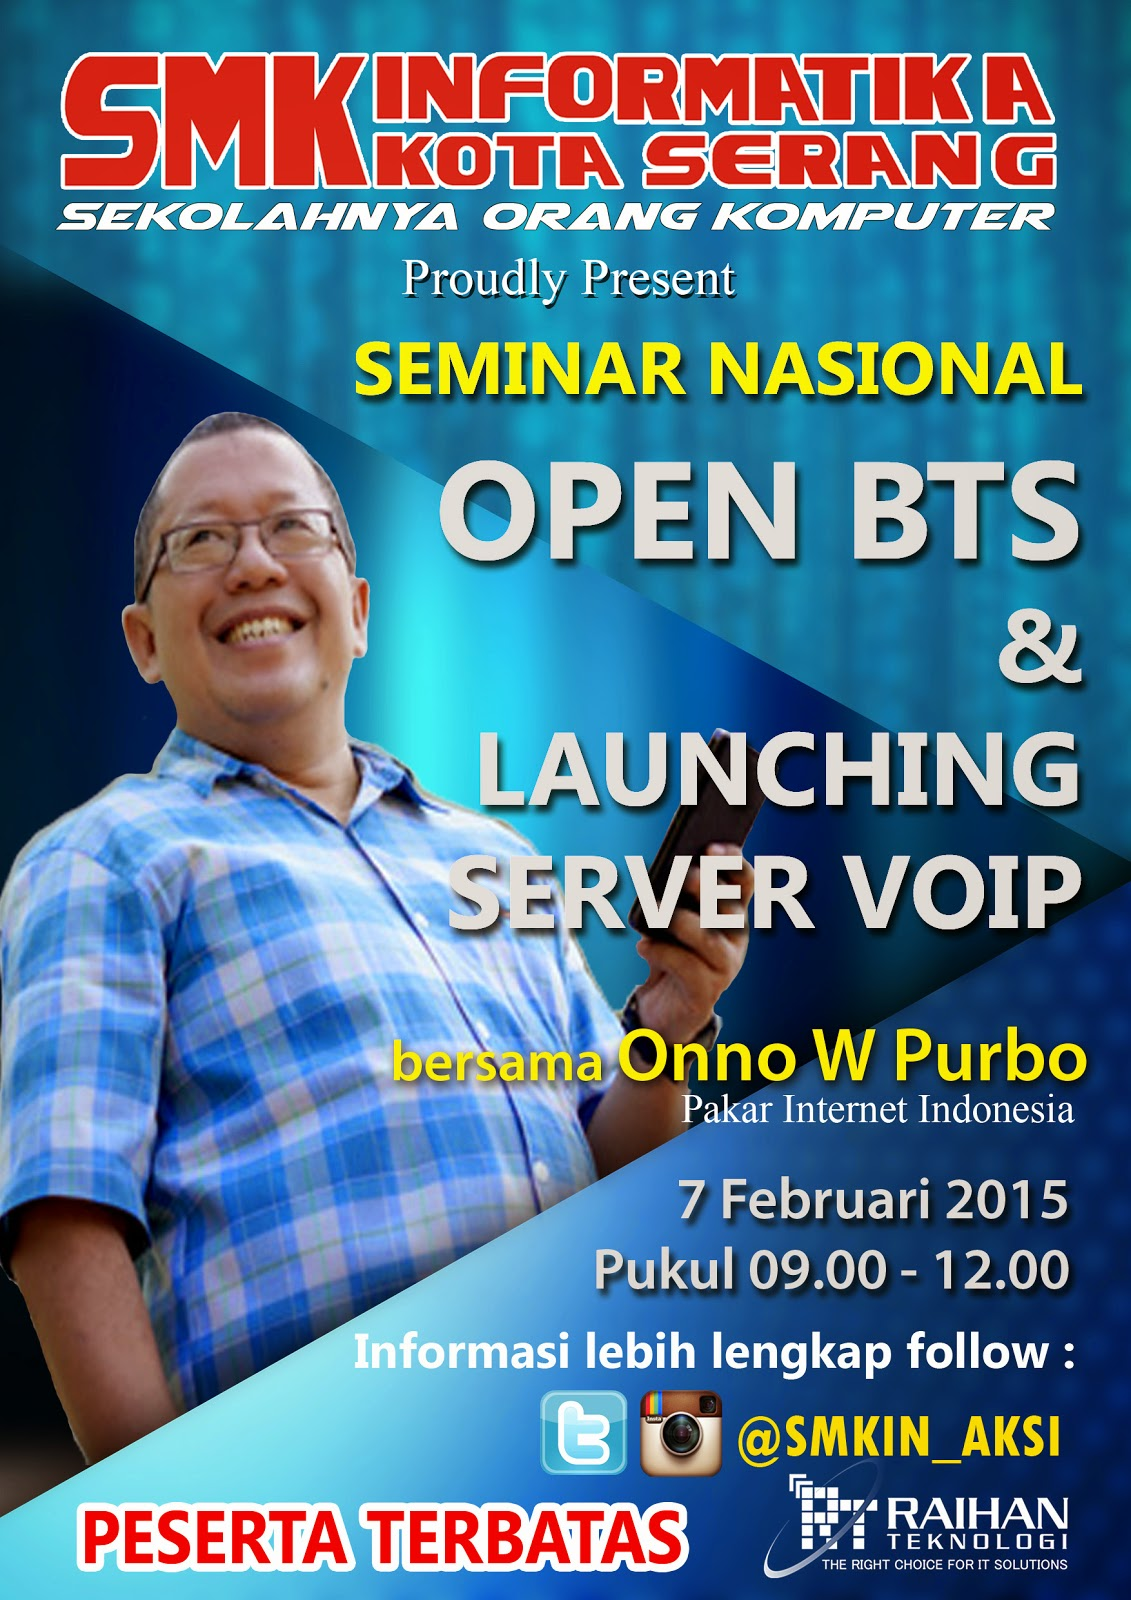 Poster Seminar Nasional Open BTS Onno W. Purbo SMK Informatika Kota Serang